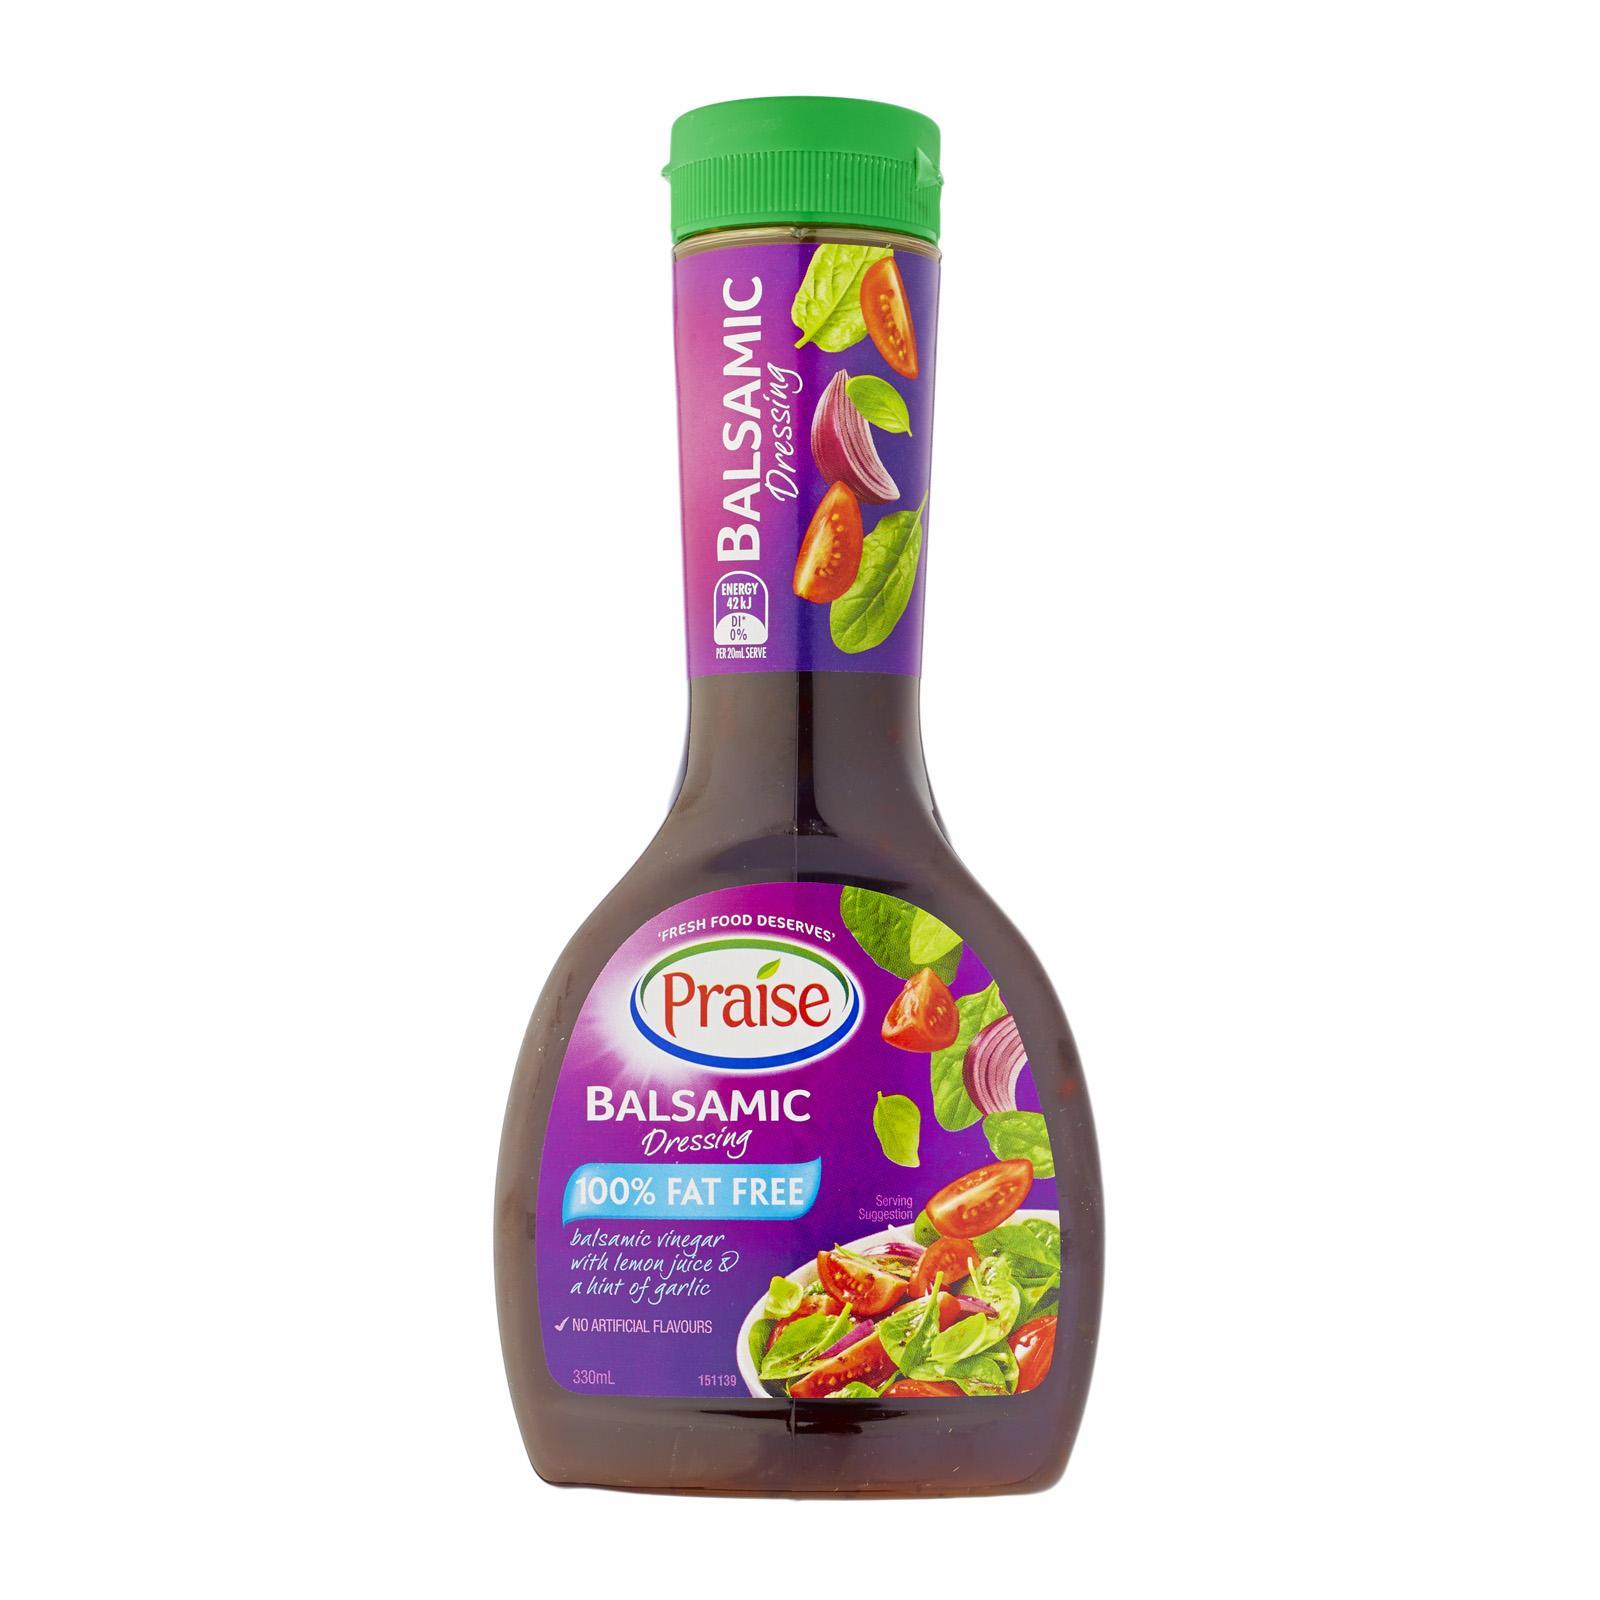 Praise Balsamic Italian Salad Dressing 100% Fat Free